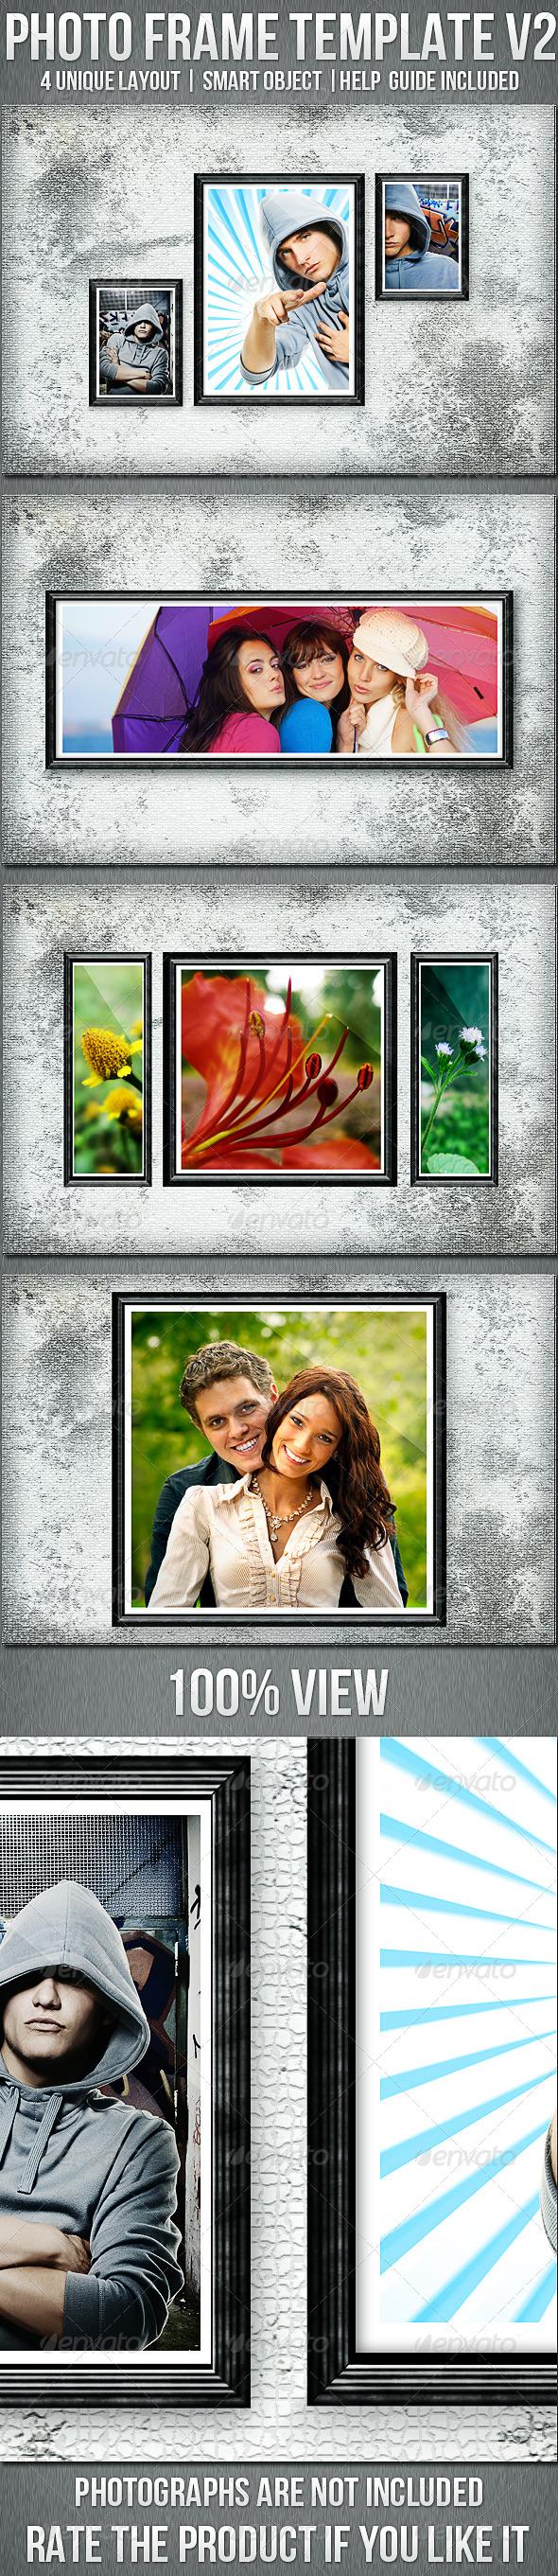 Photo Frame Templates V2 - Photo Templates Graphics